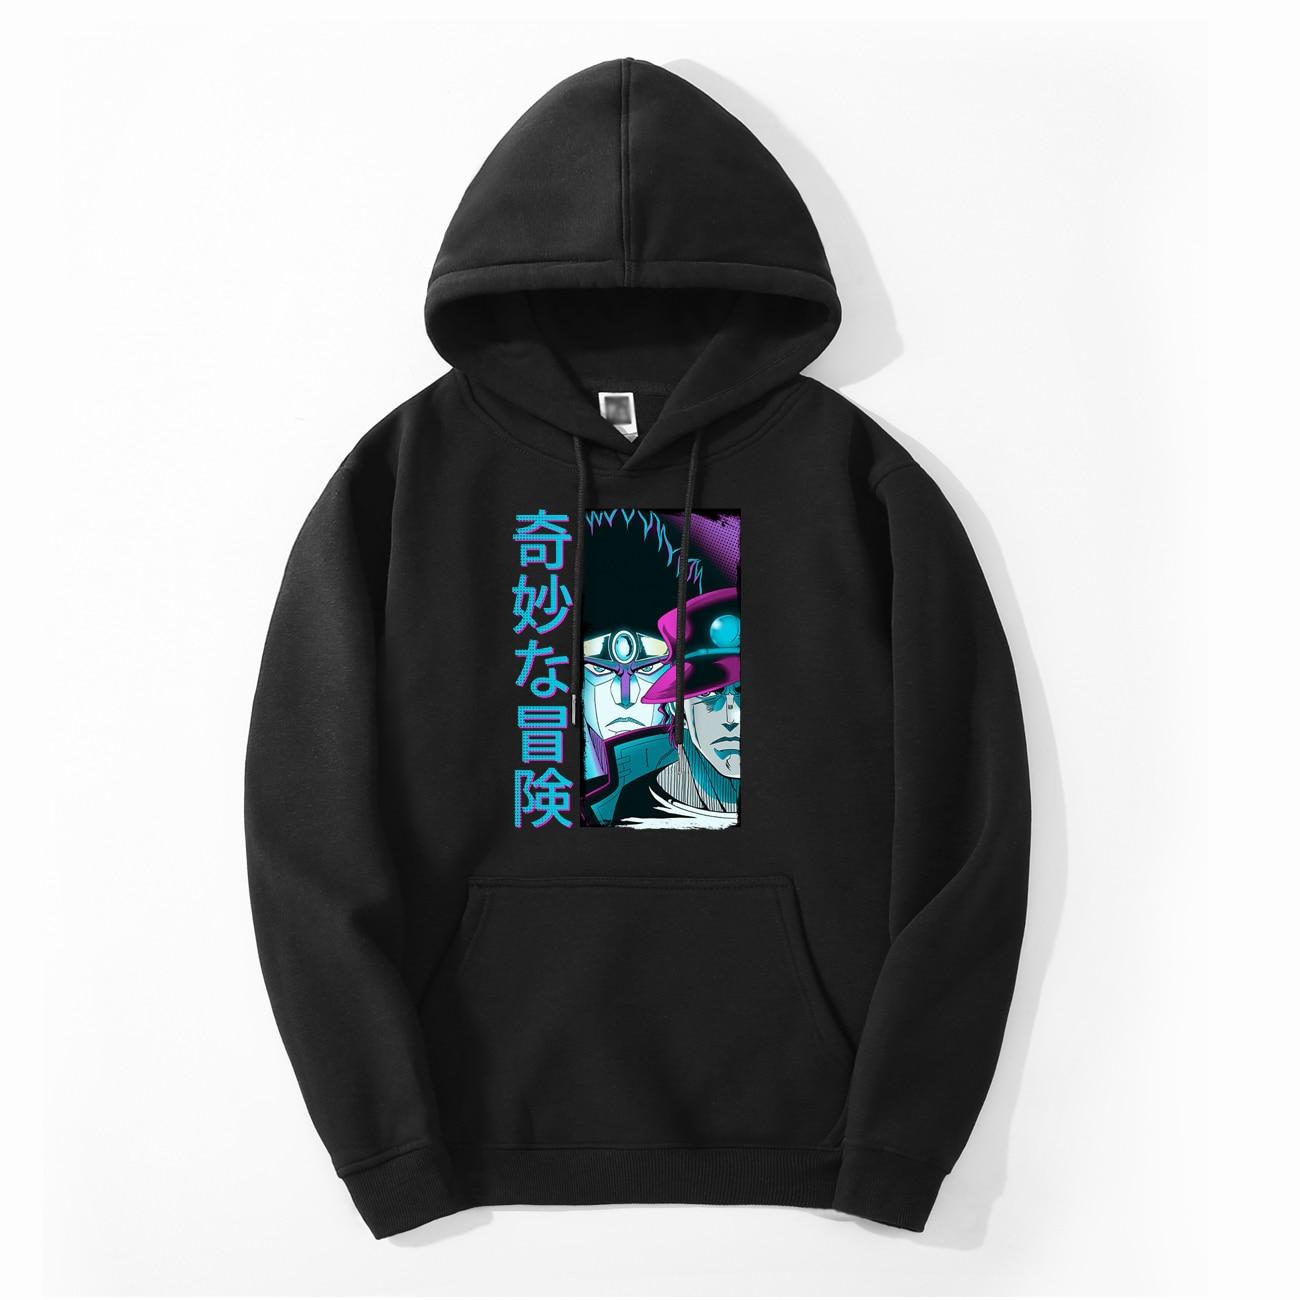 Kujo Jotaro Men JOJO Hoodies Sweatshirt Fleece Autumn Winter Japan Anime Star Platinum Streetwear Jojos Bizarre Adventure Hoodie